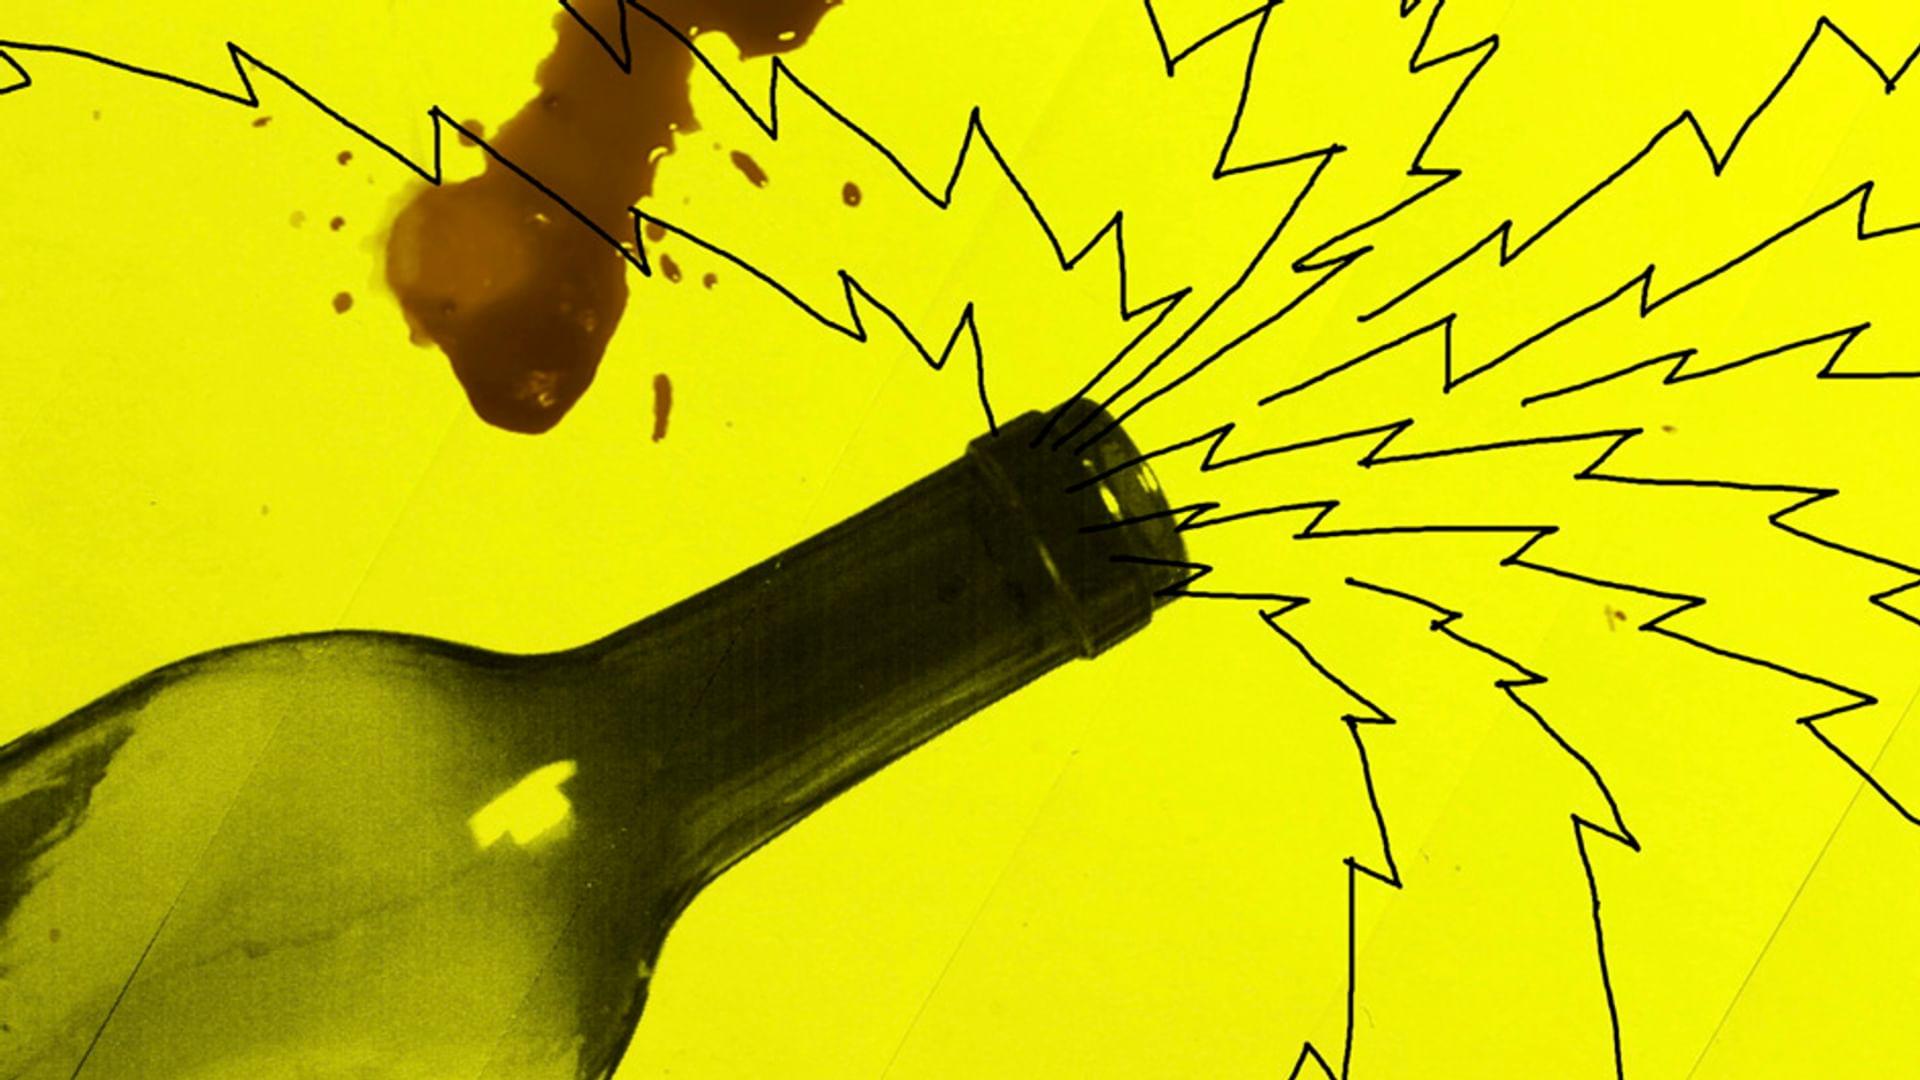 Punkovino: 10 disidentes del vino natural